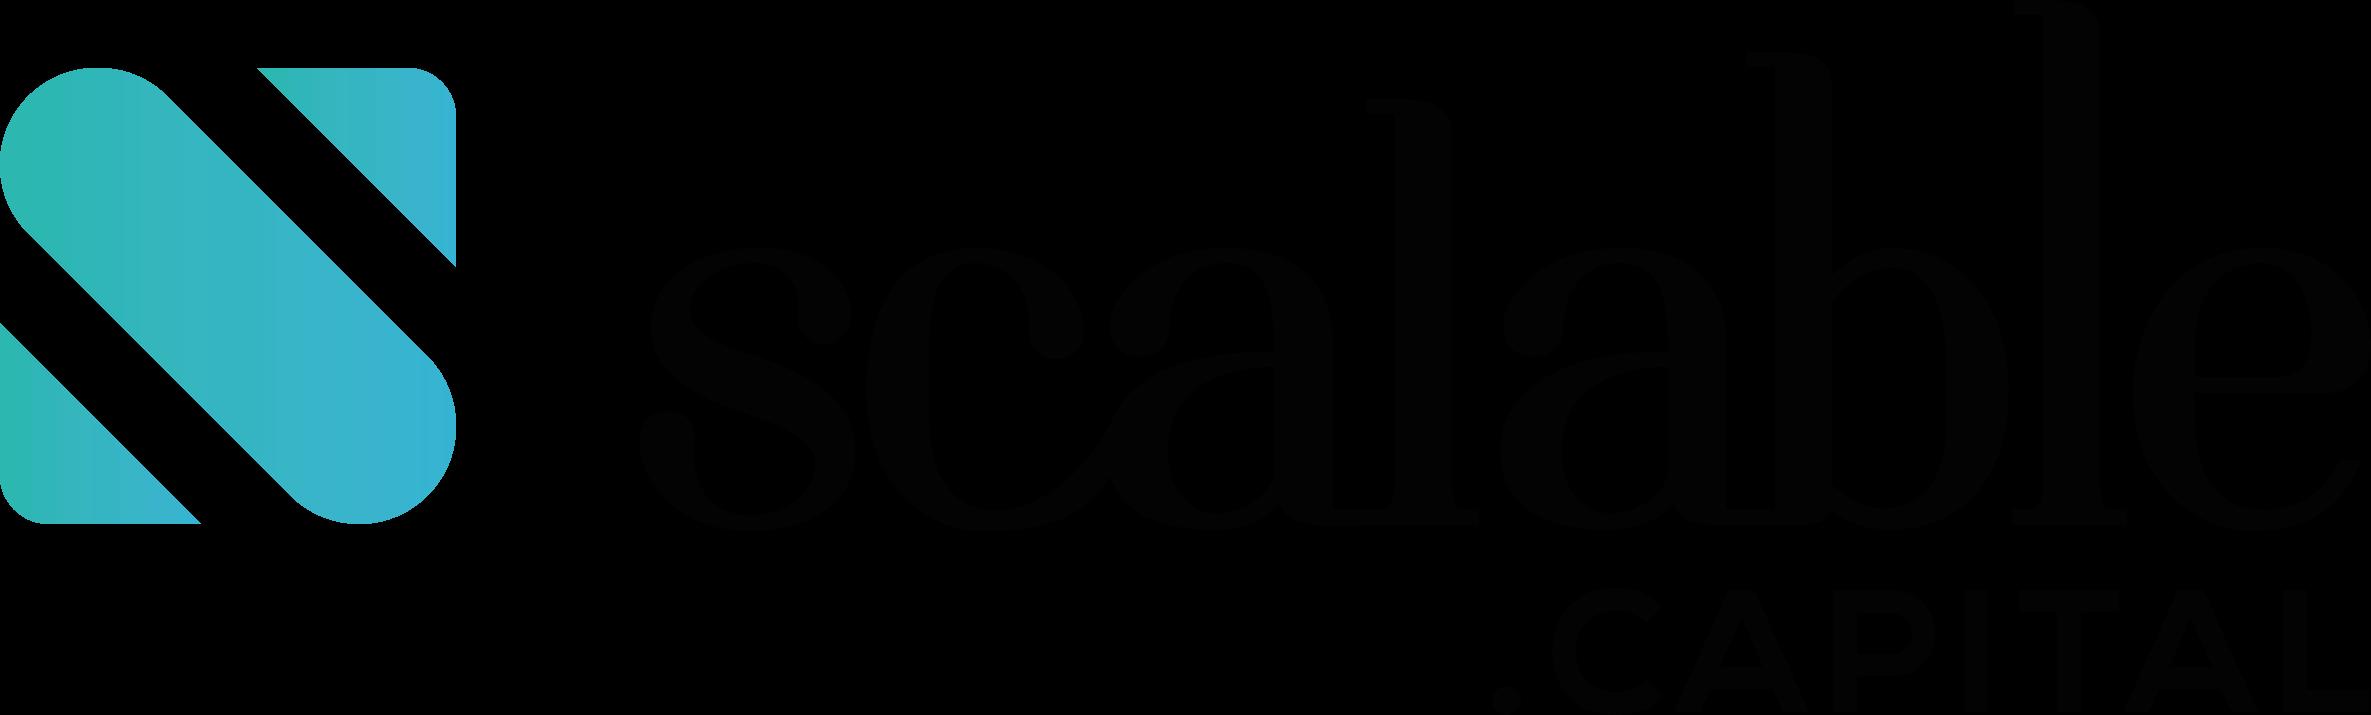 Scalable Capital Logo